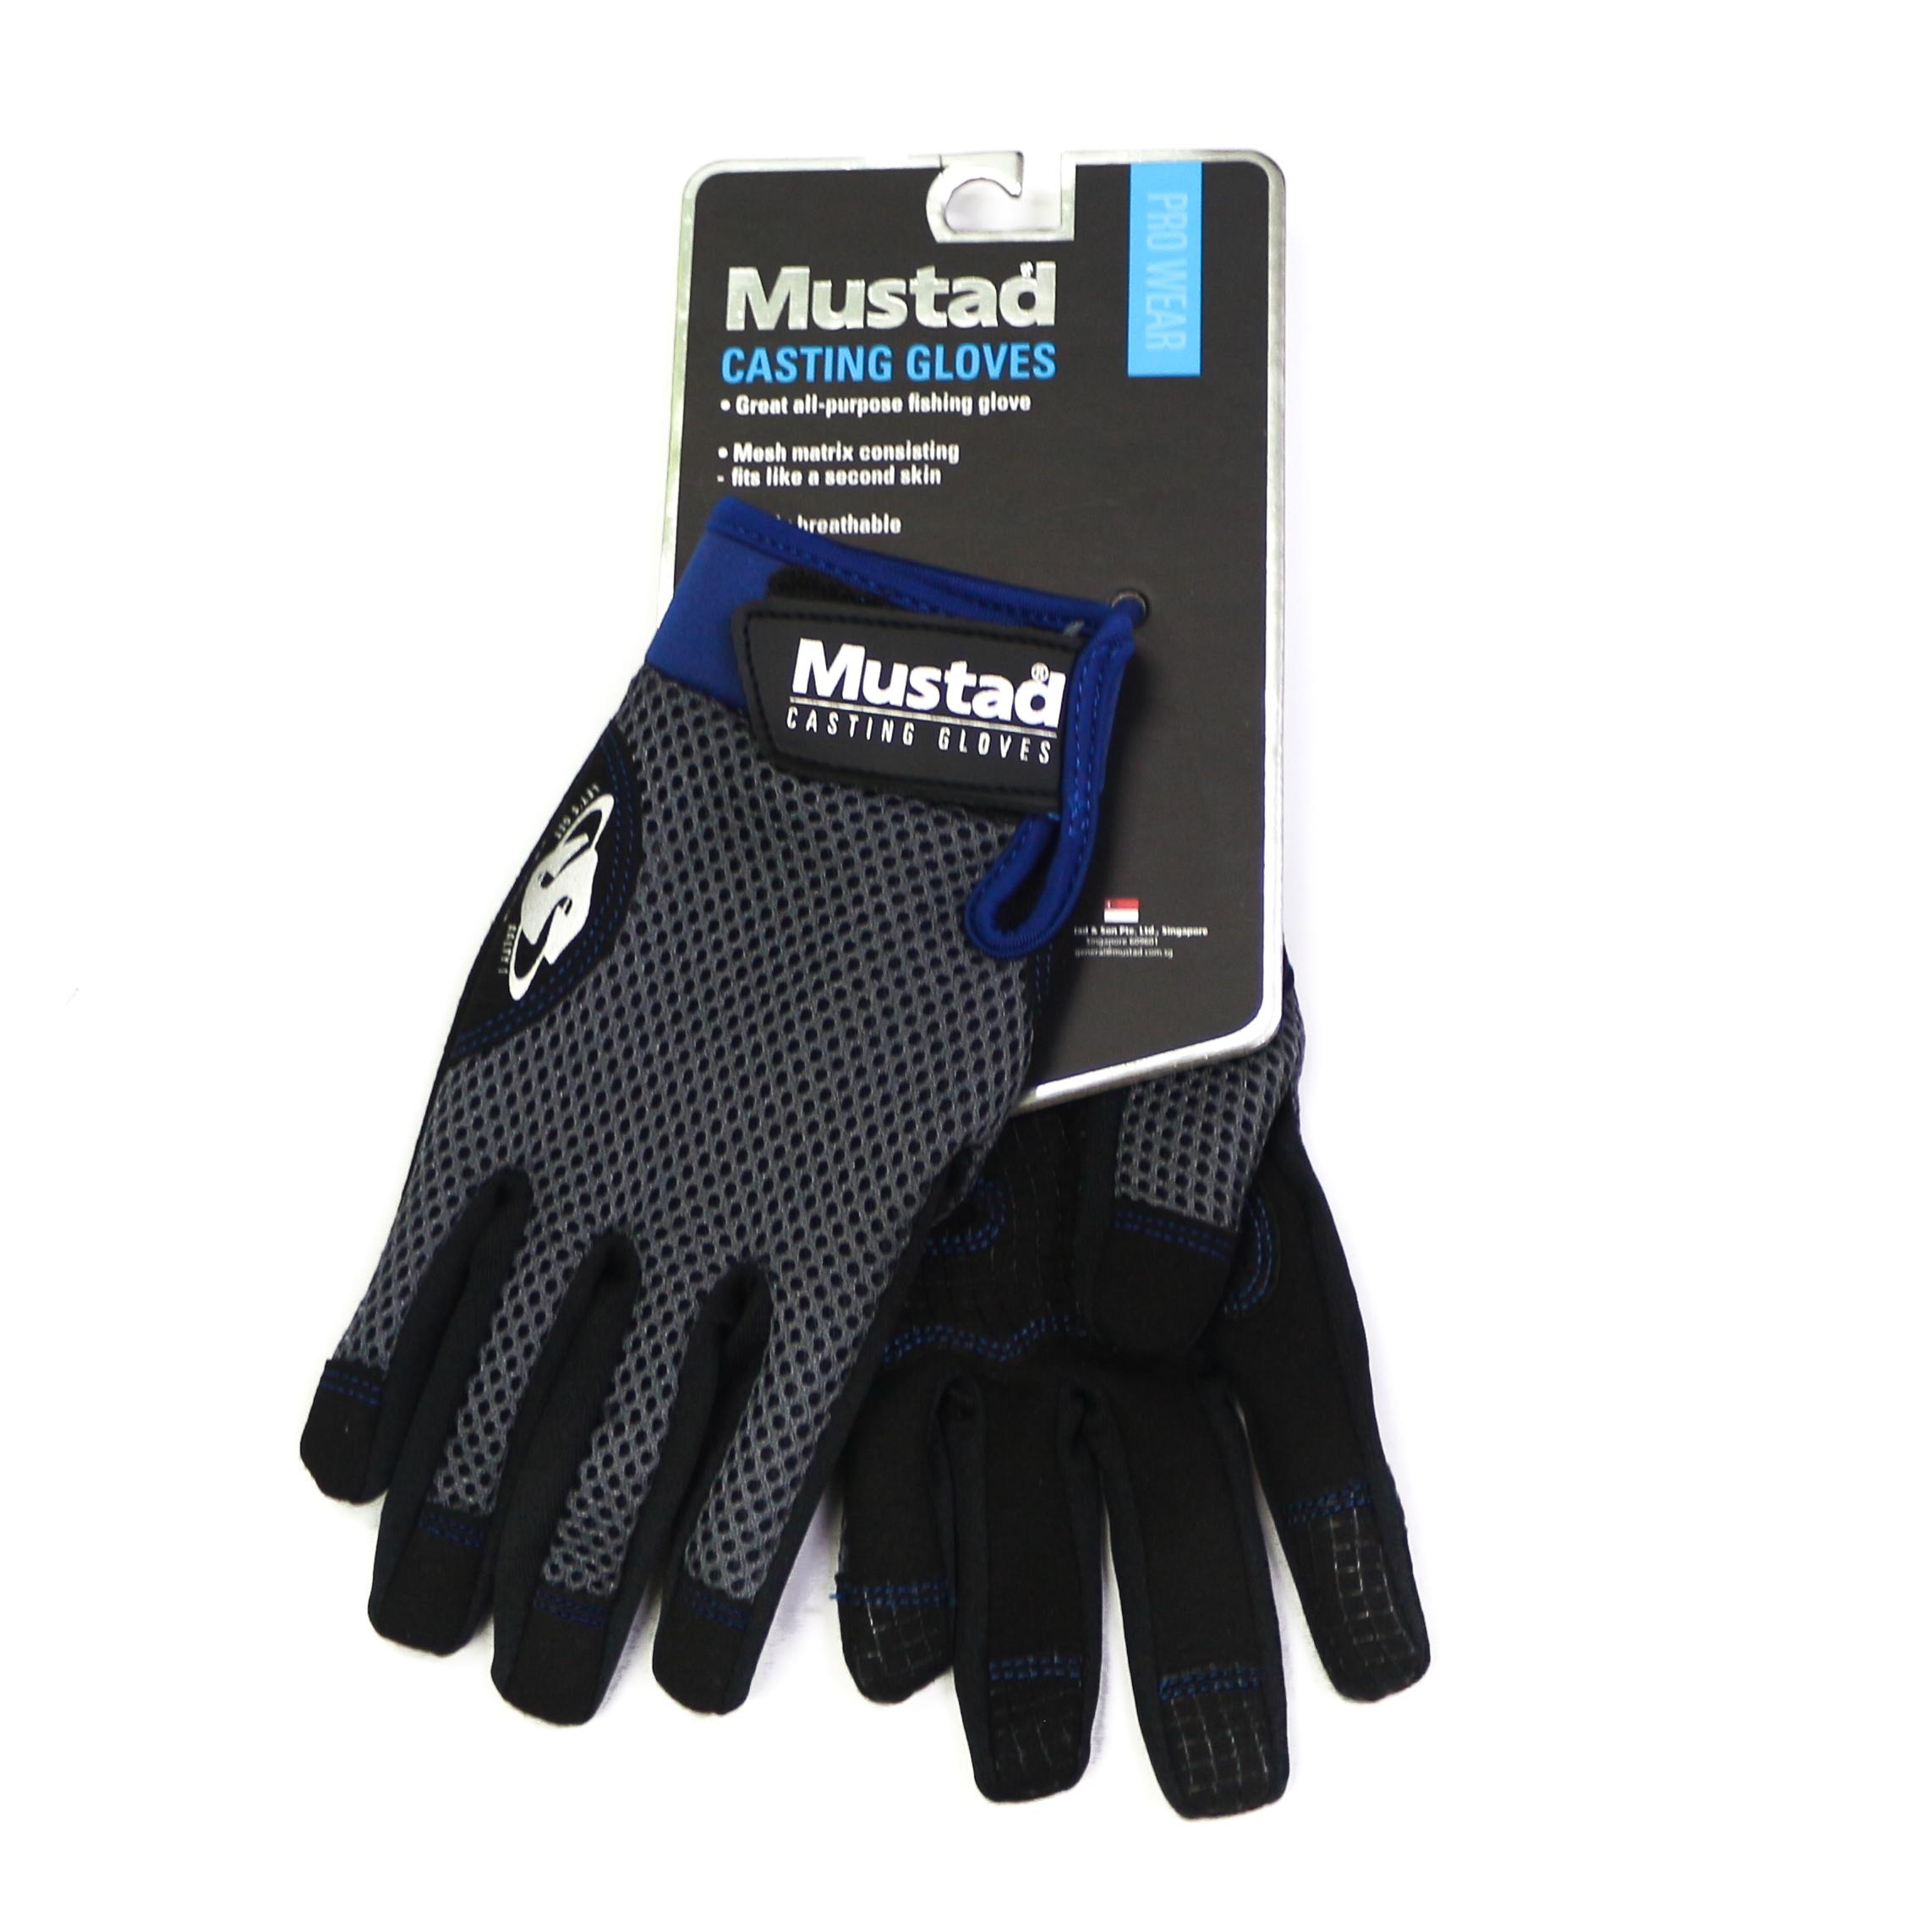 Mustad GL 004 Sun Glove Black/Blue Size S (9437)